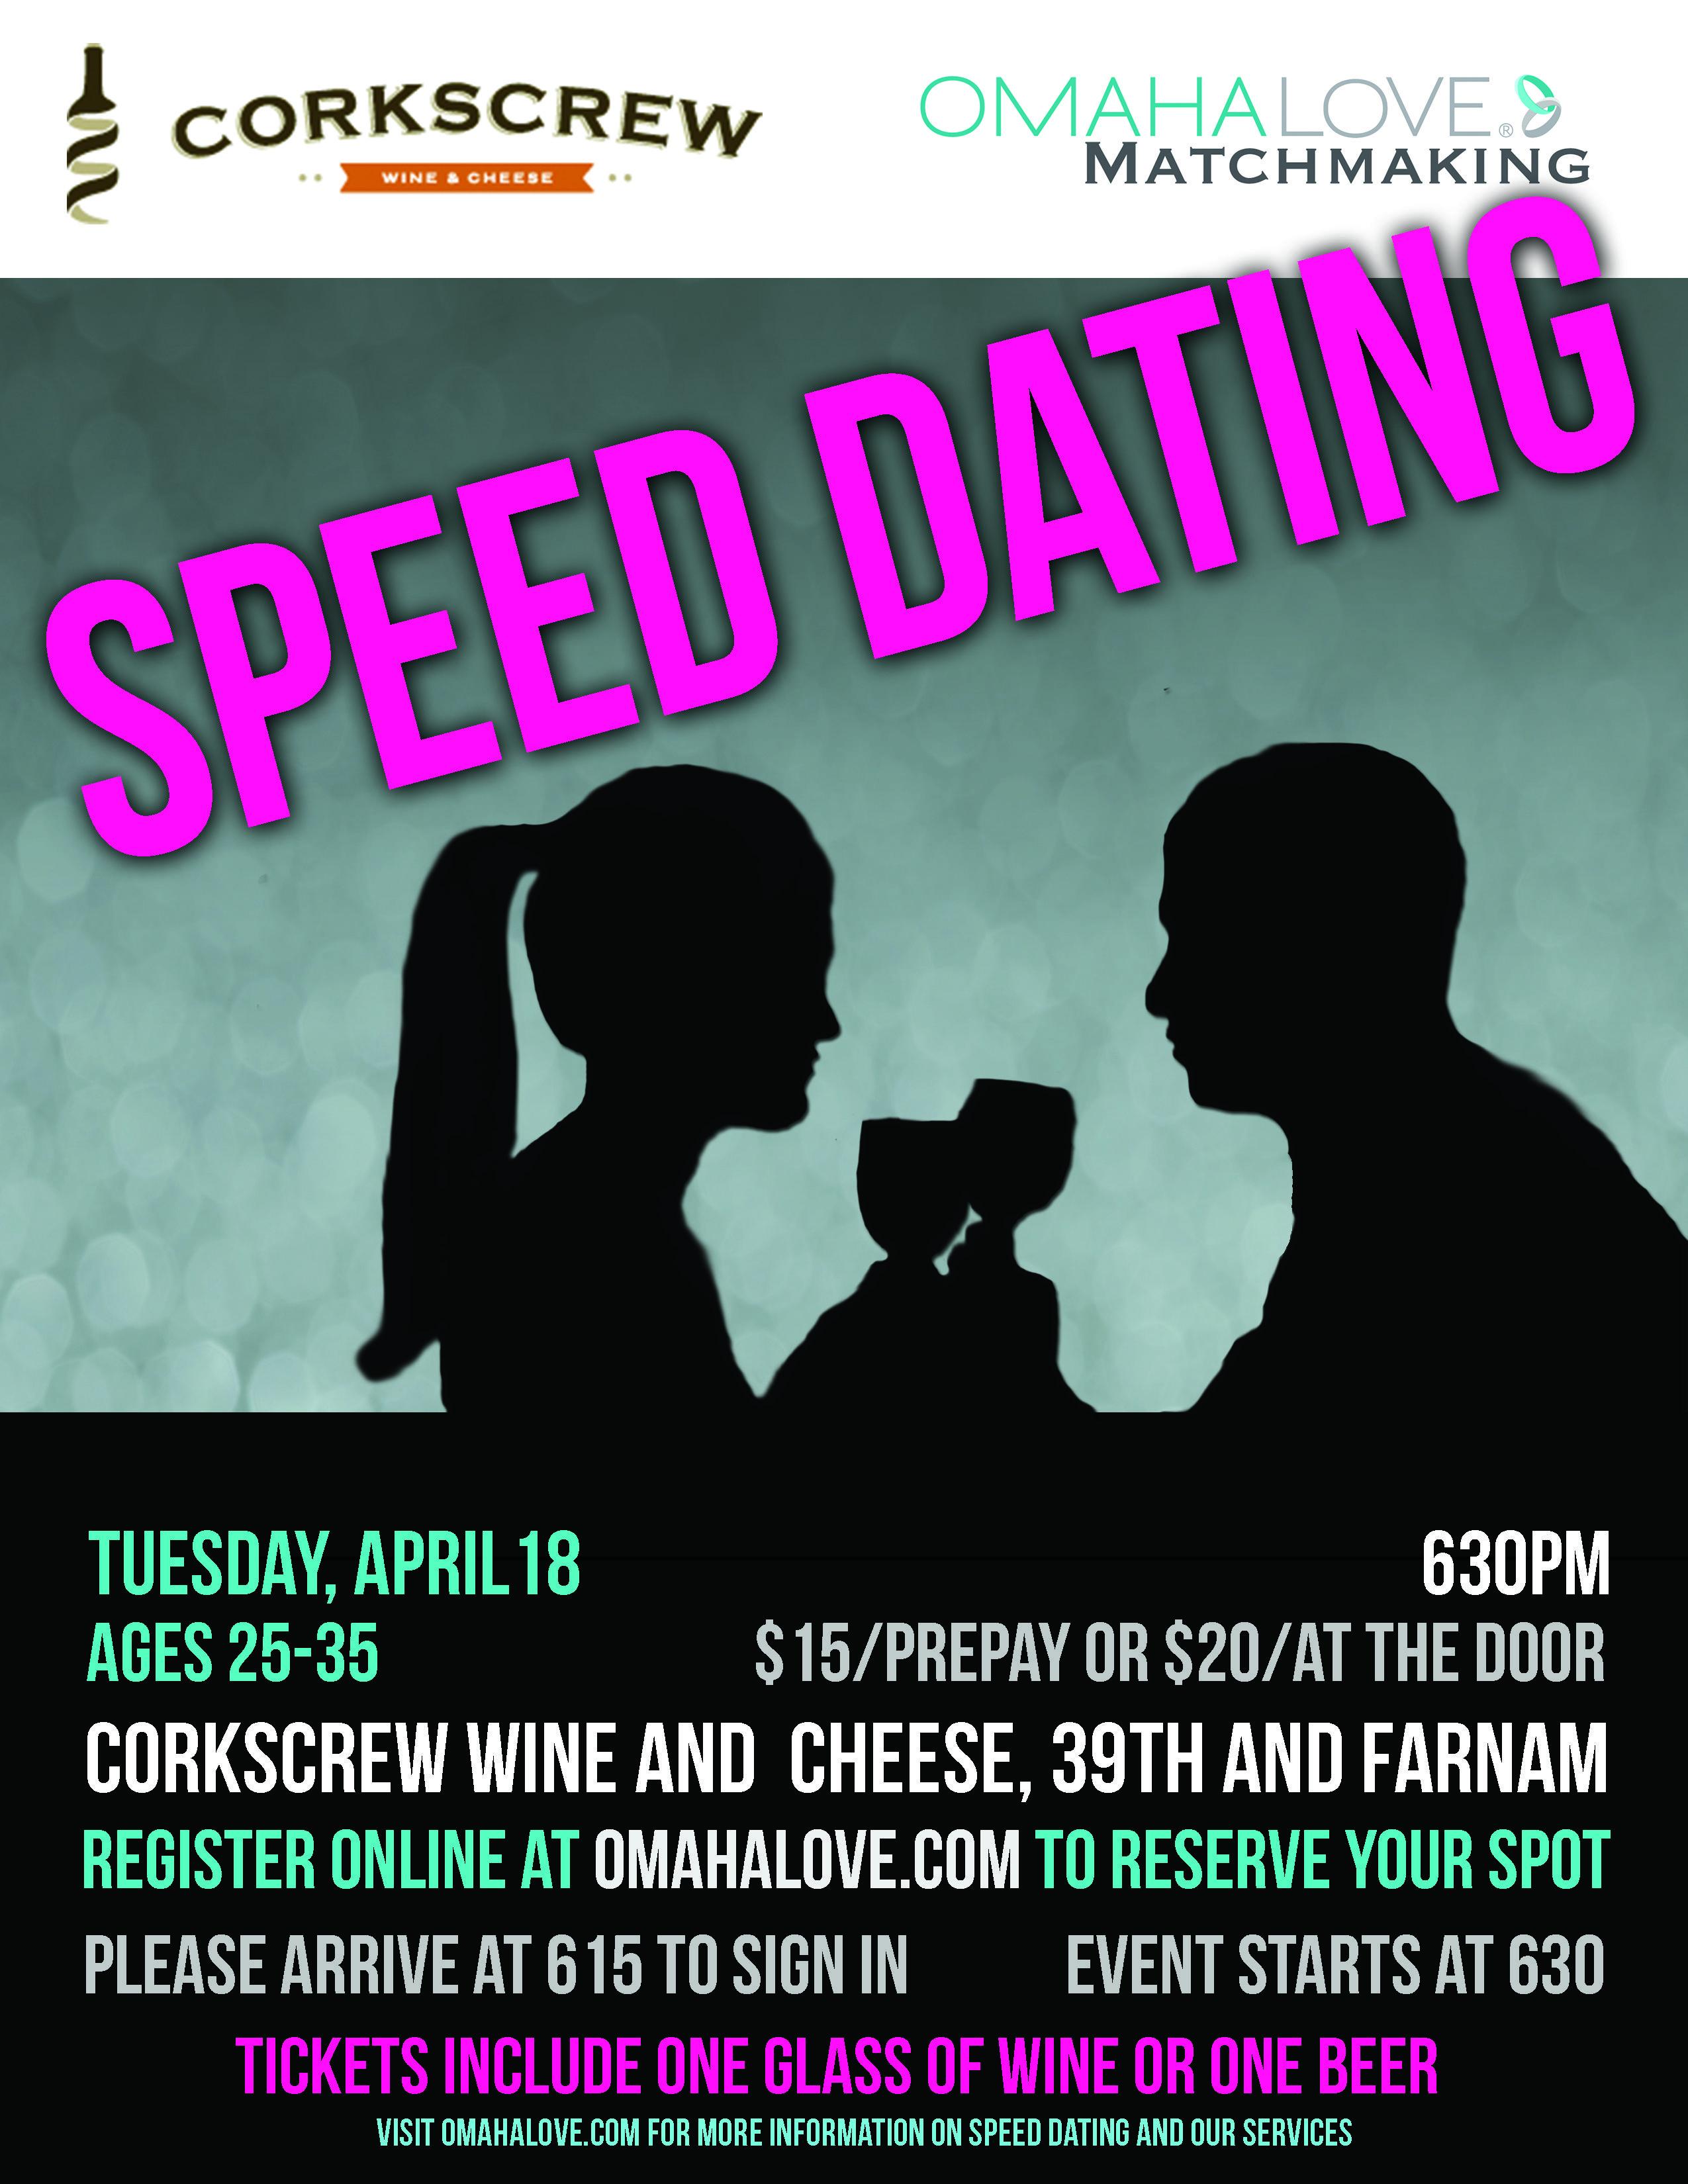 Dating σε απευθείας σύνδεση παιχνίδια για 18 Πι-Τζέι dating σημείο